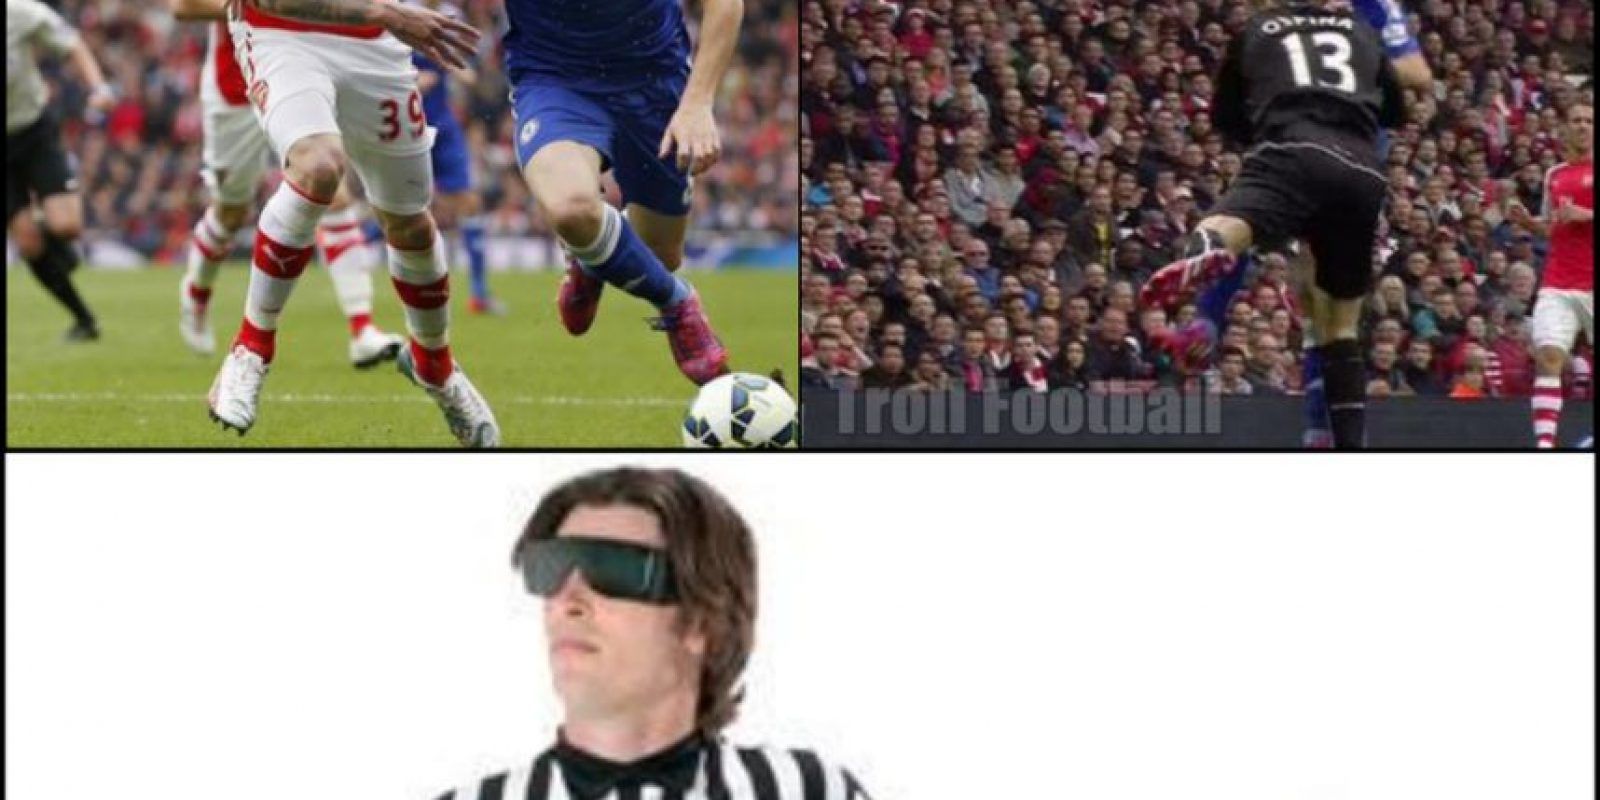 Esto provocó que los jugadores de Chelsea protestaran penal, pero no se marcó. Foto:Vía Twitter.com/troll__football